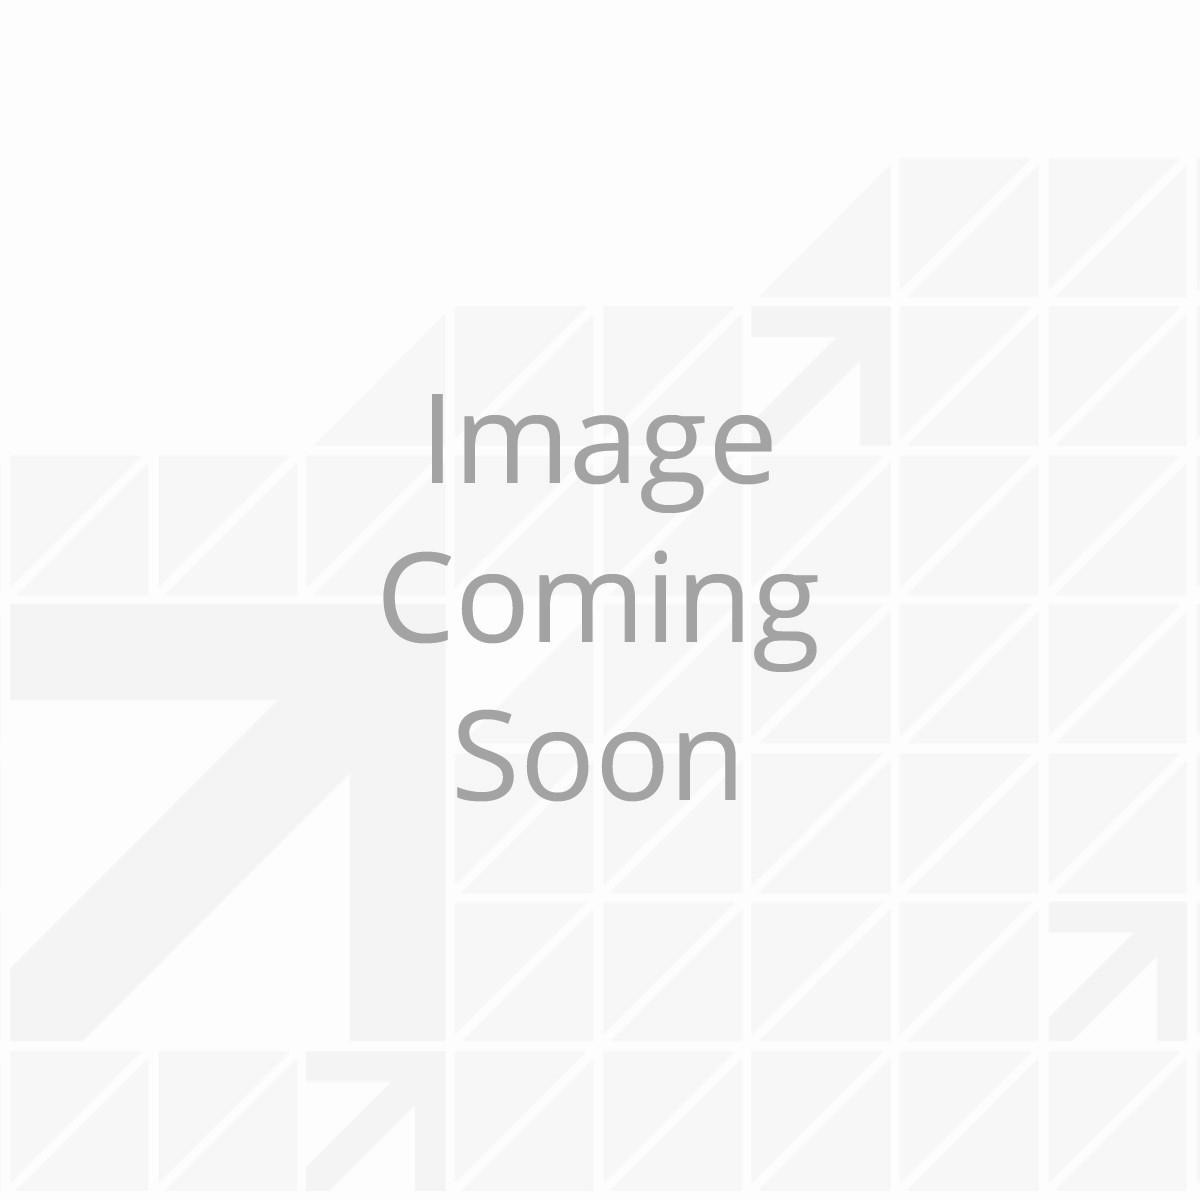 Toylok® Truck Bed Mounting Kit